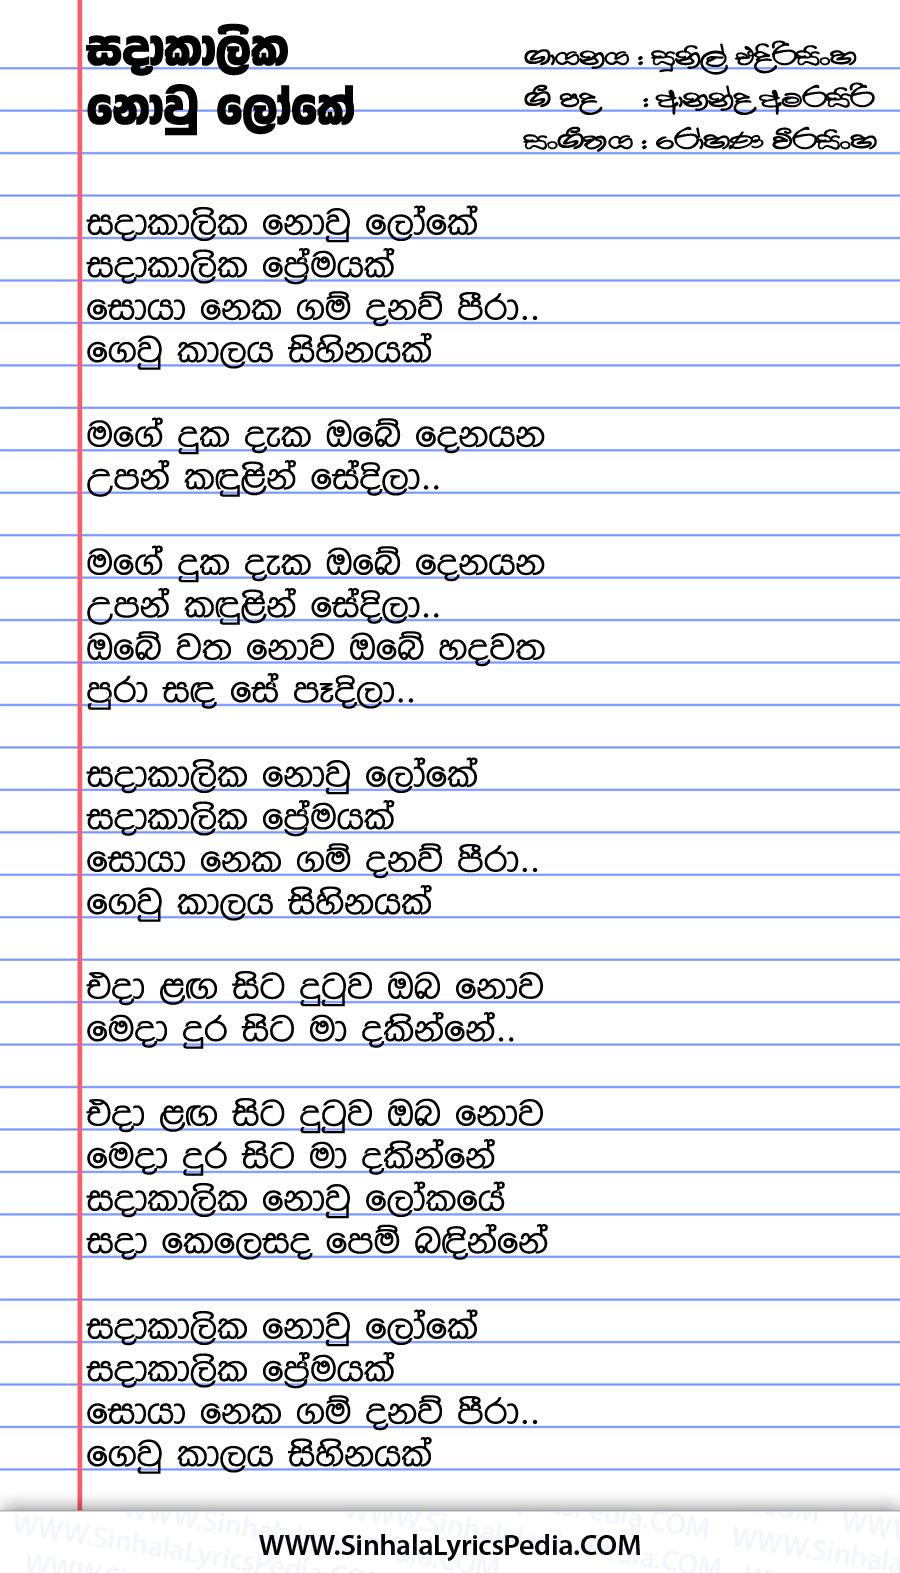 Sadakalika Nowu Loke Sadakalika Premayak Song Lyrics